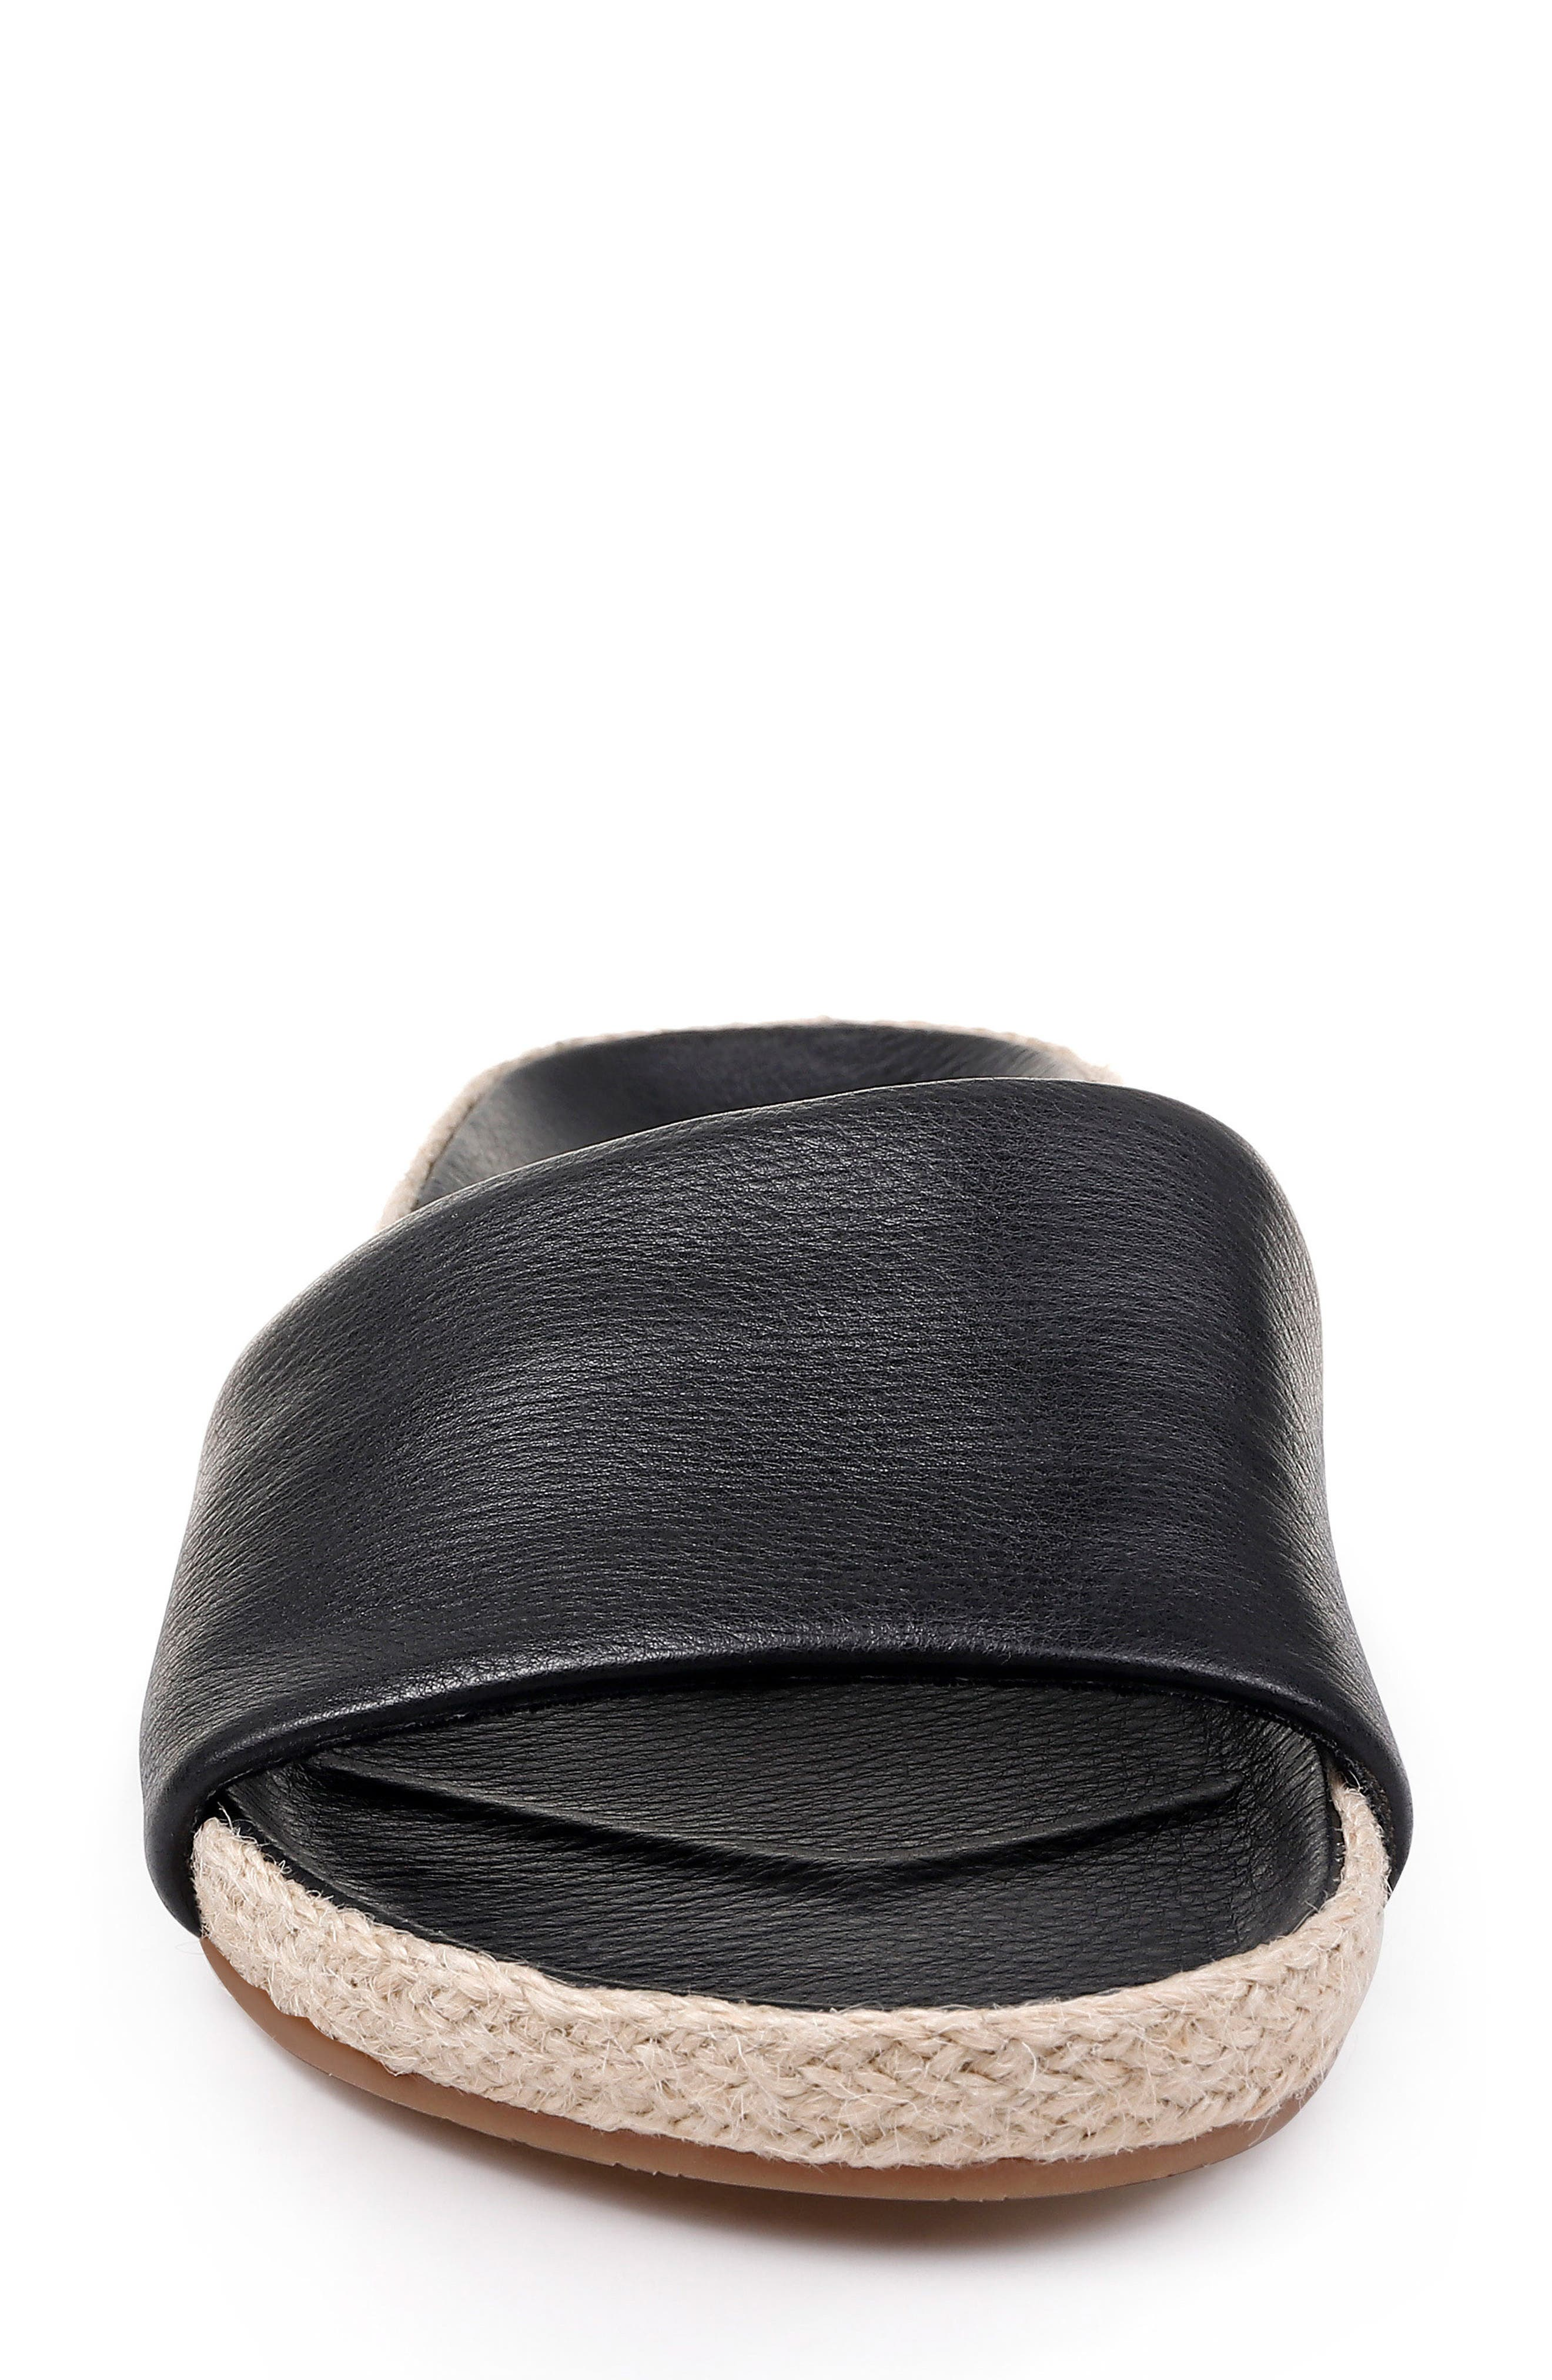 SPLENDID, Sandford Espadrille Slide Sandal, Alternate thumbnail 4, color, BLACK LEATHER